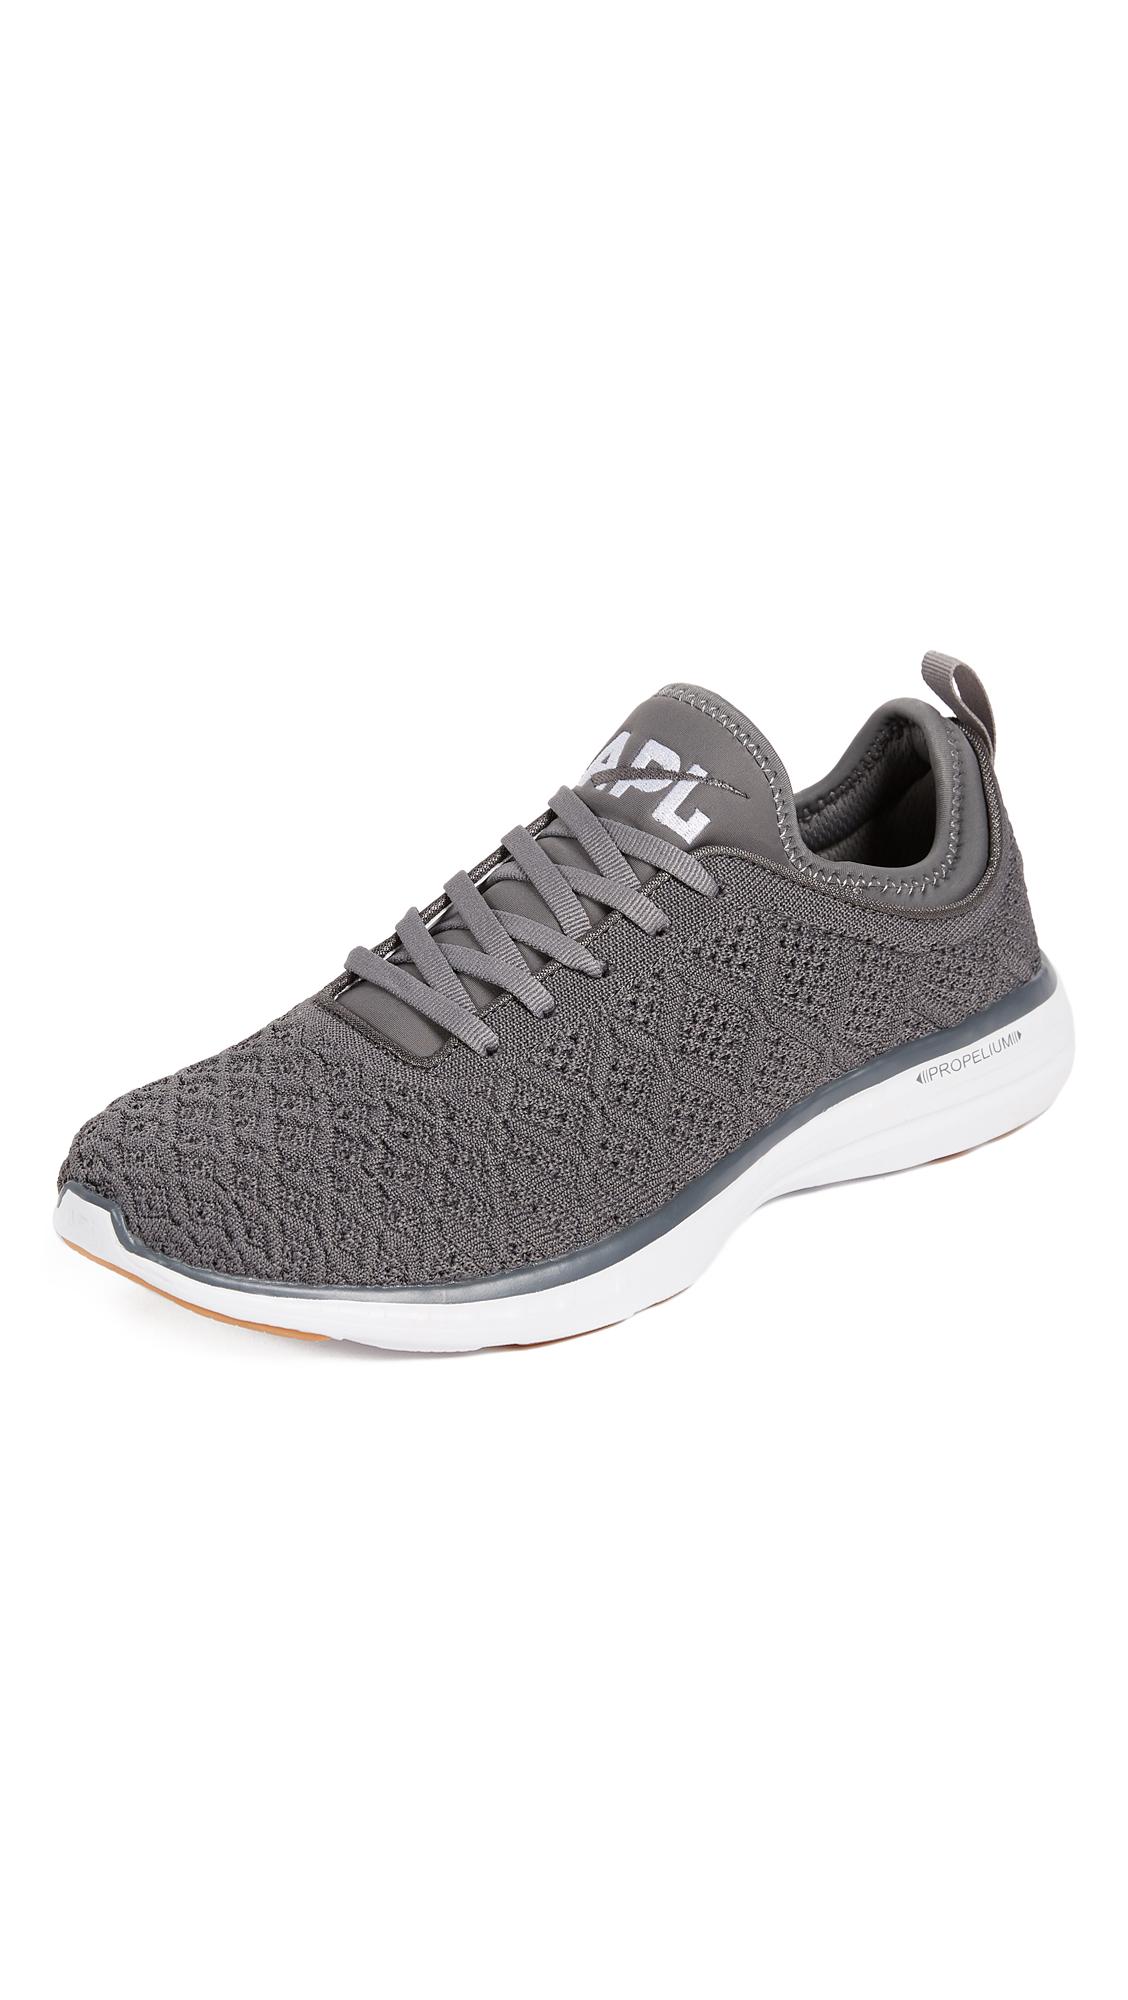 1440a145b1c Apl Athletic Propulsion Labs Techloom Phantom Running Sneakers In  Gunmetal White Gum